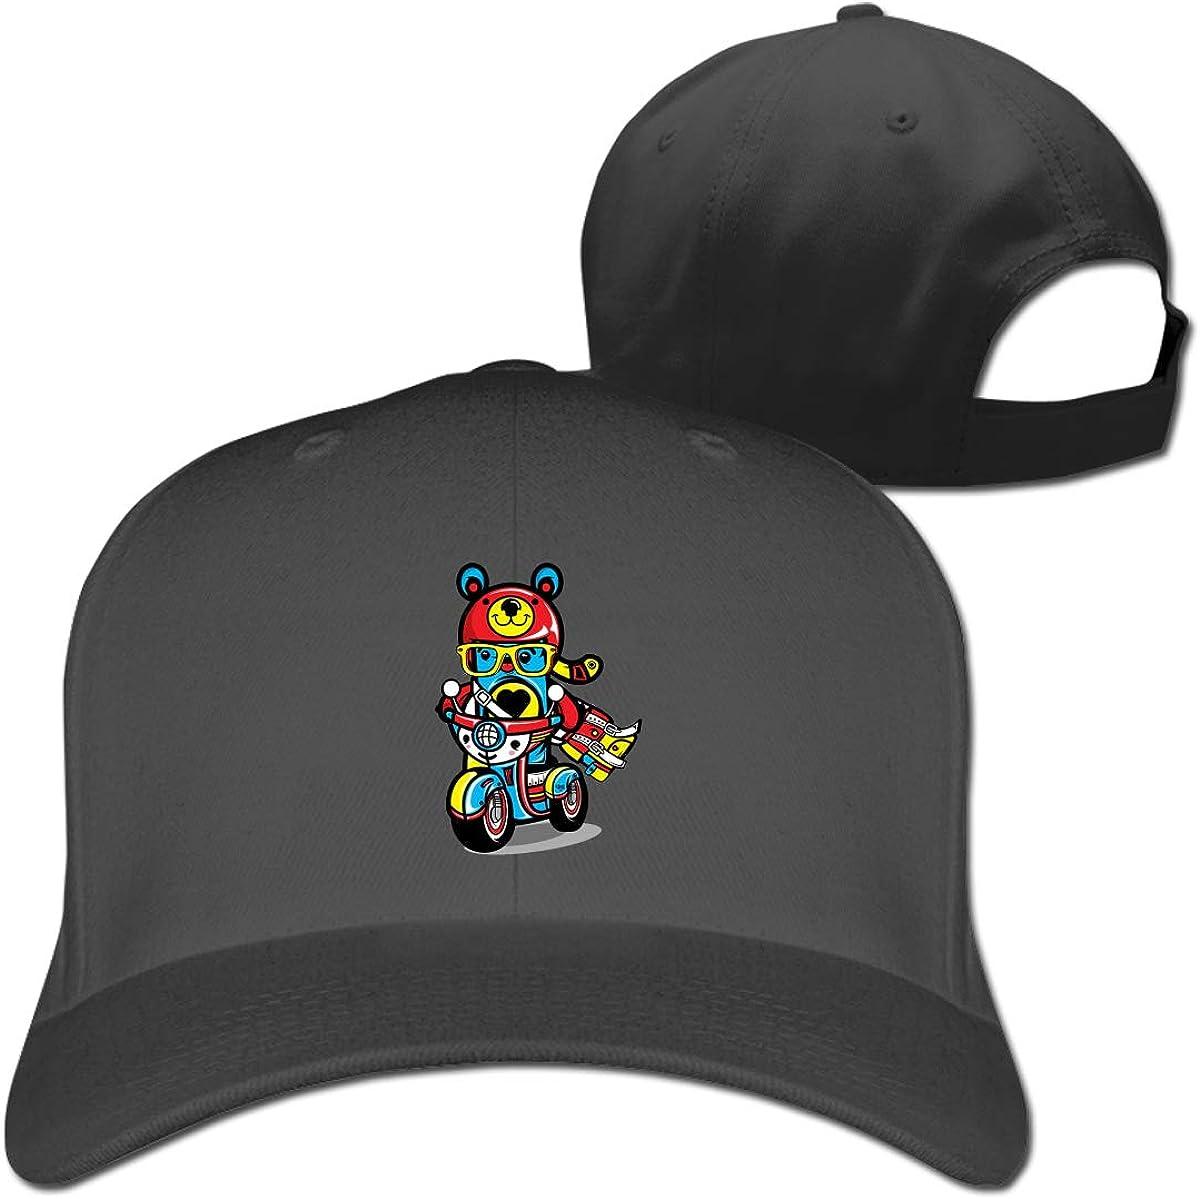 ChocoToy Fashion Adjustable Cotton Baseball Caps Trucker Driver Hat Outdoor Cap Black